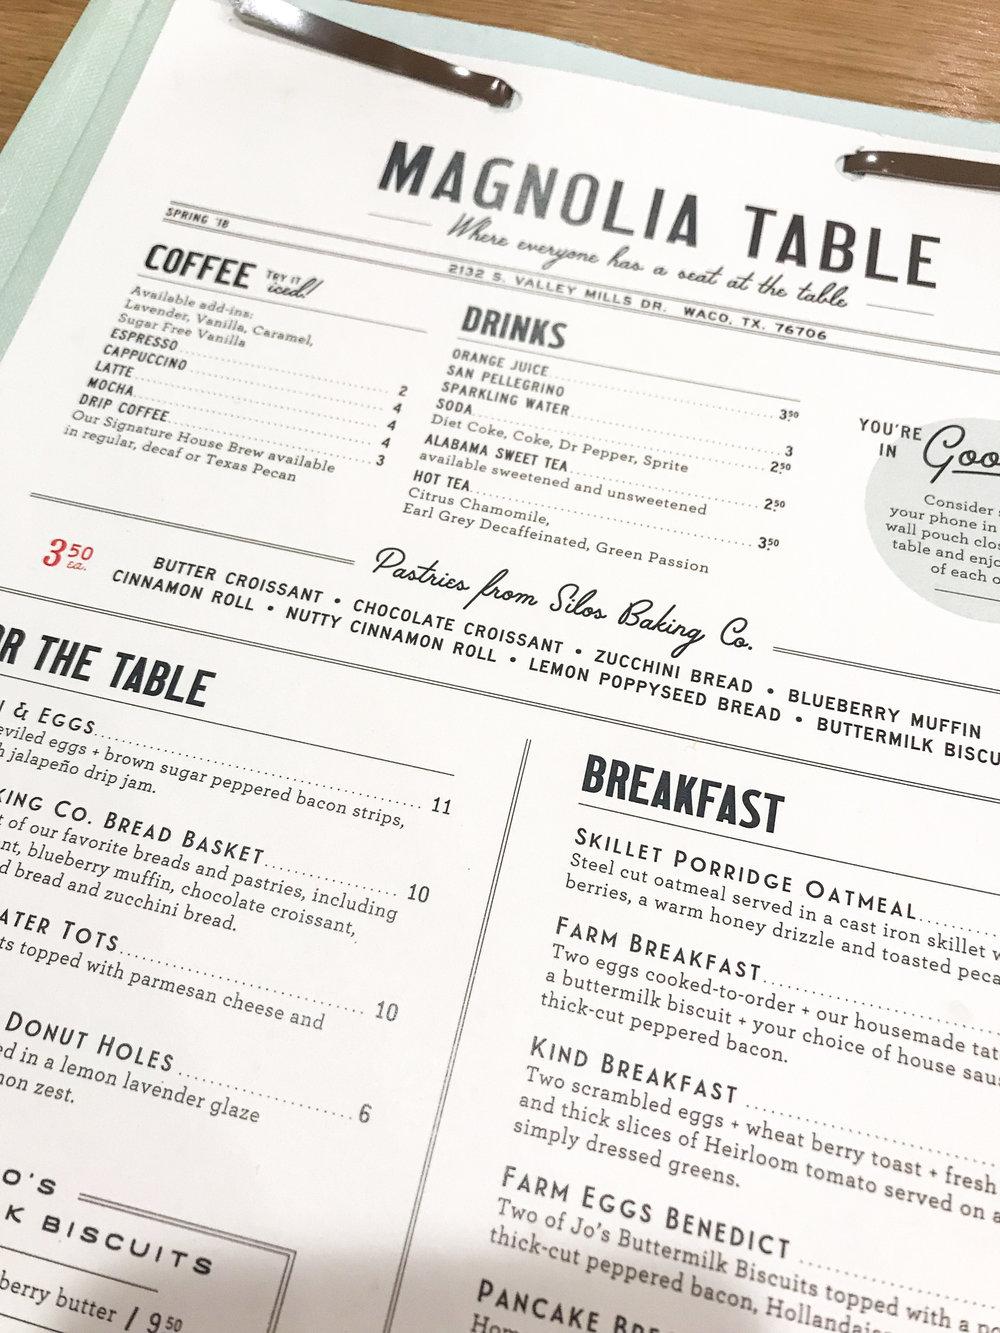 Waco, TX - Magnolia Texas - Visting Magnolia - Waco Travel Blog